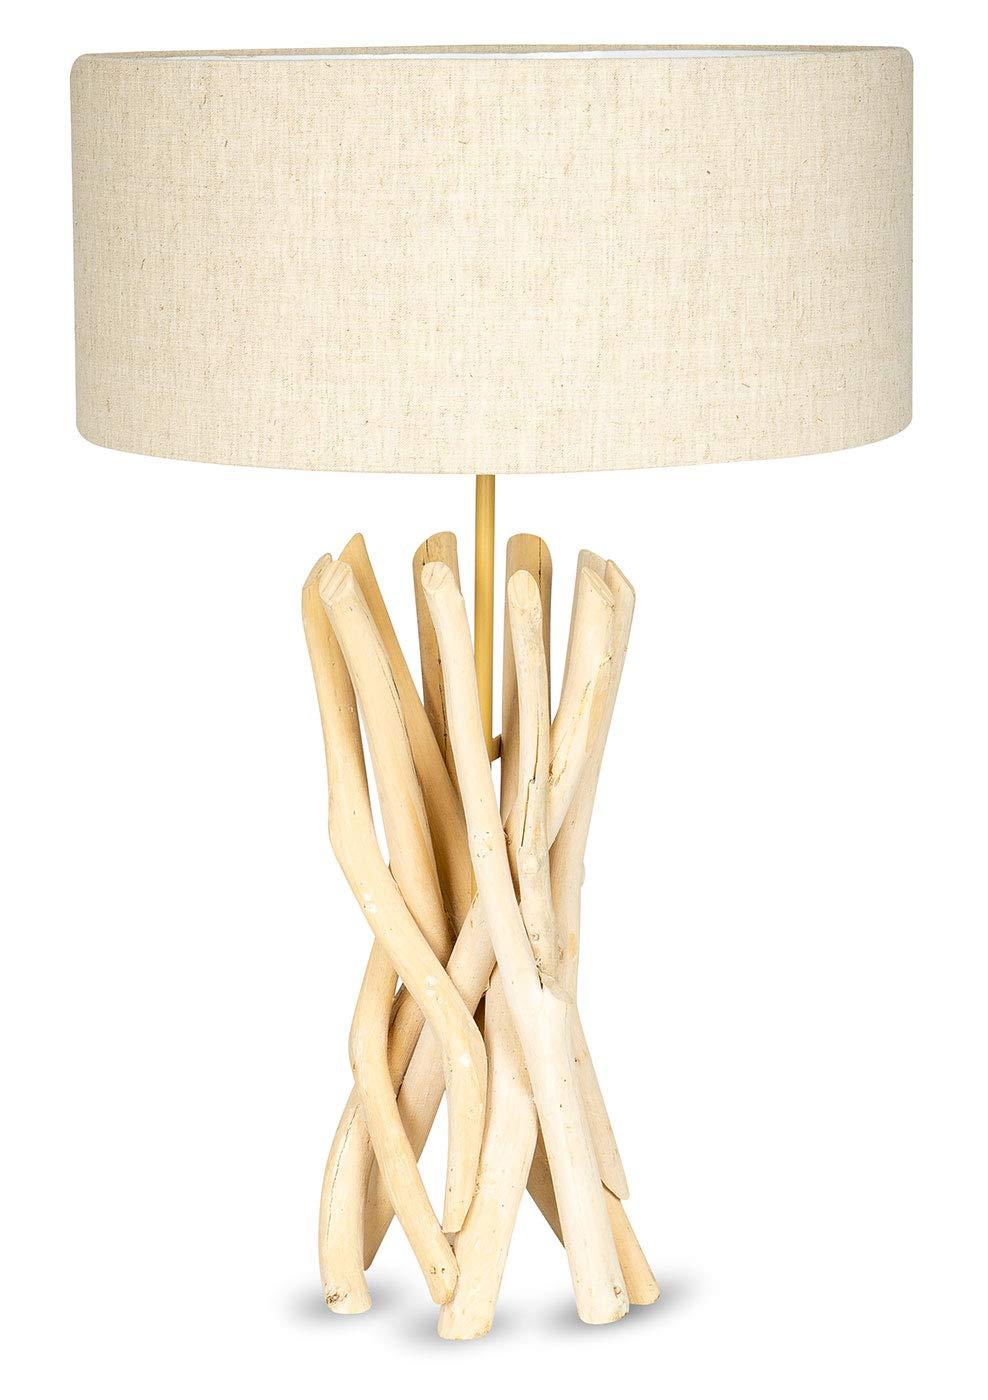 Lampe Stehlampe 62cm Hoch Holz Holzlampe Unikat Braun Treibholz